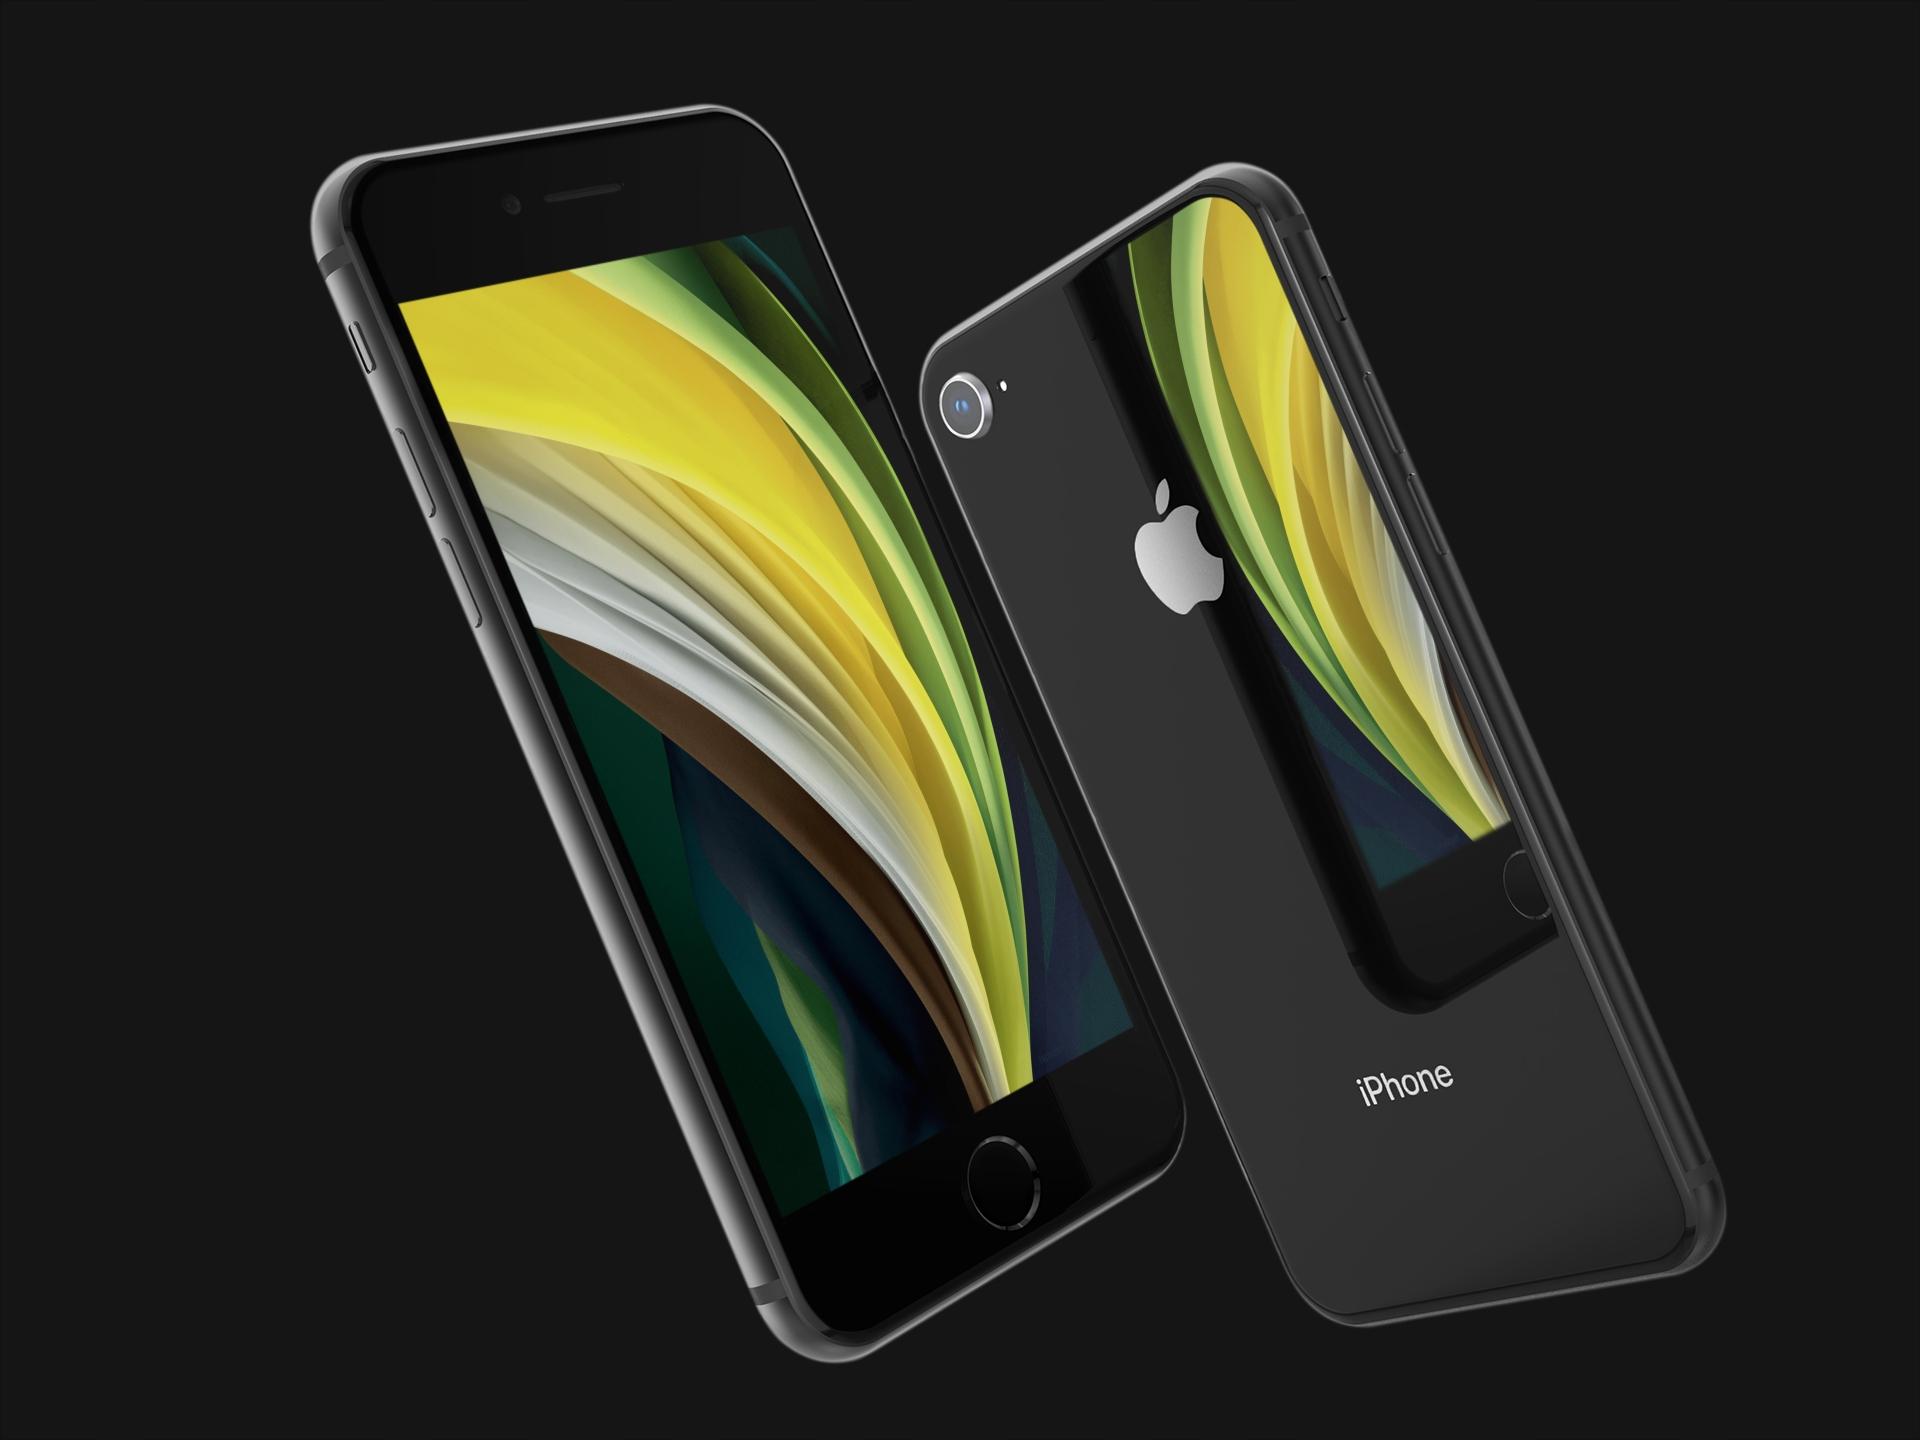 Прошлогодний iPhone по цене среднебюджетника: стереозвук, Wi-Fi 6, 50% зарядки за 30 минут